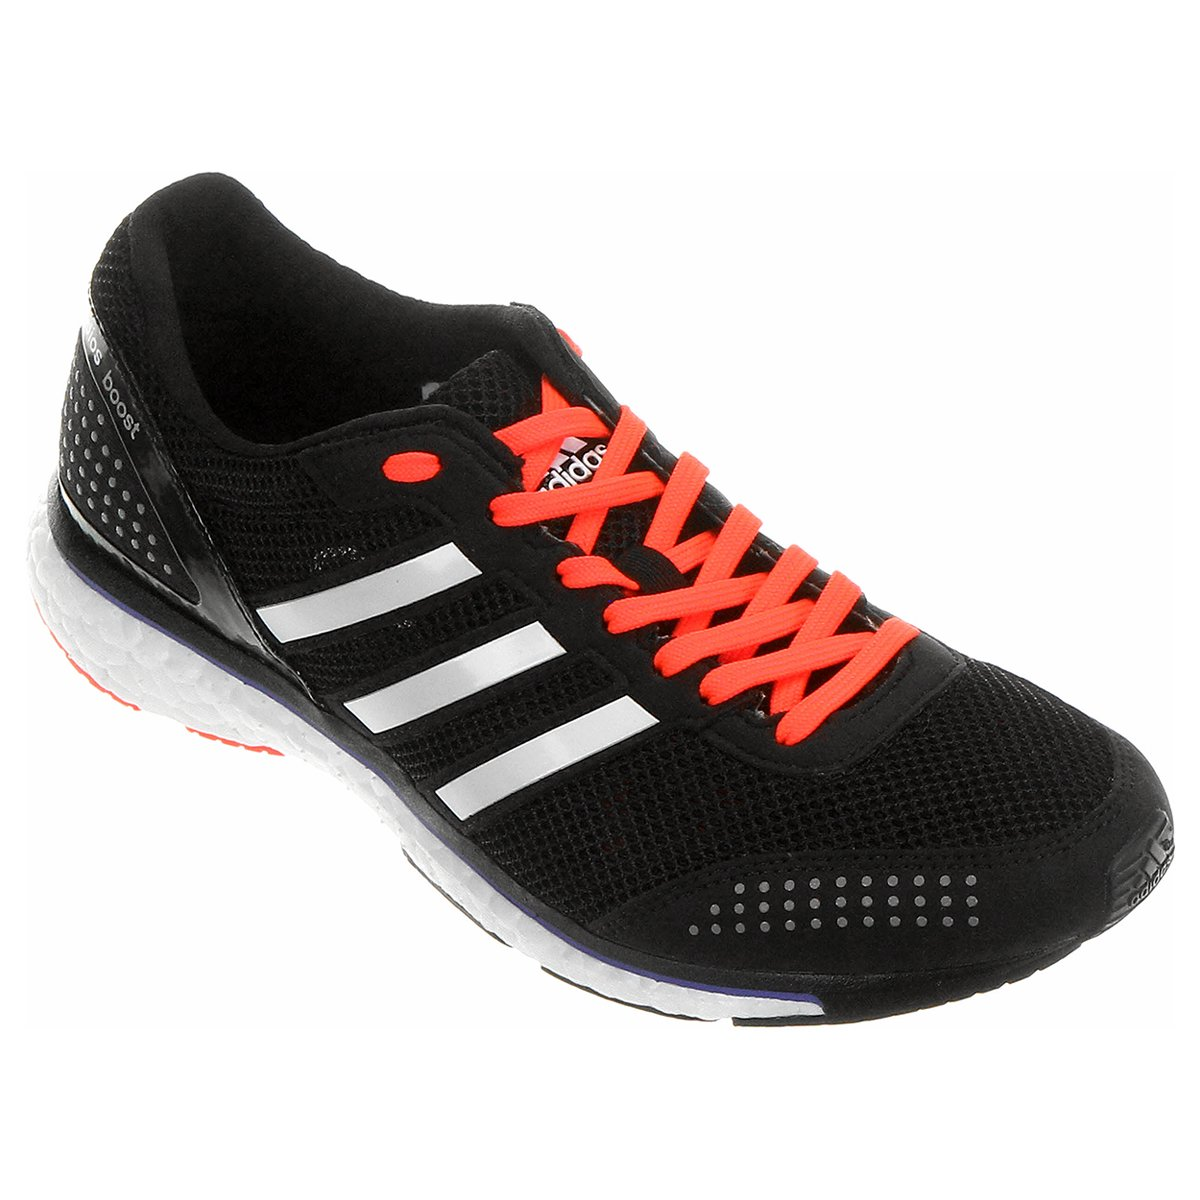 bacc317e3 Tênis Adidas Adizero Adios Boost 2 - Compre Agora